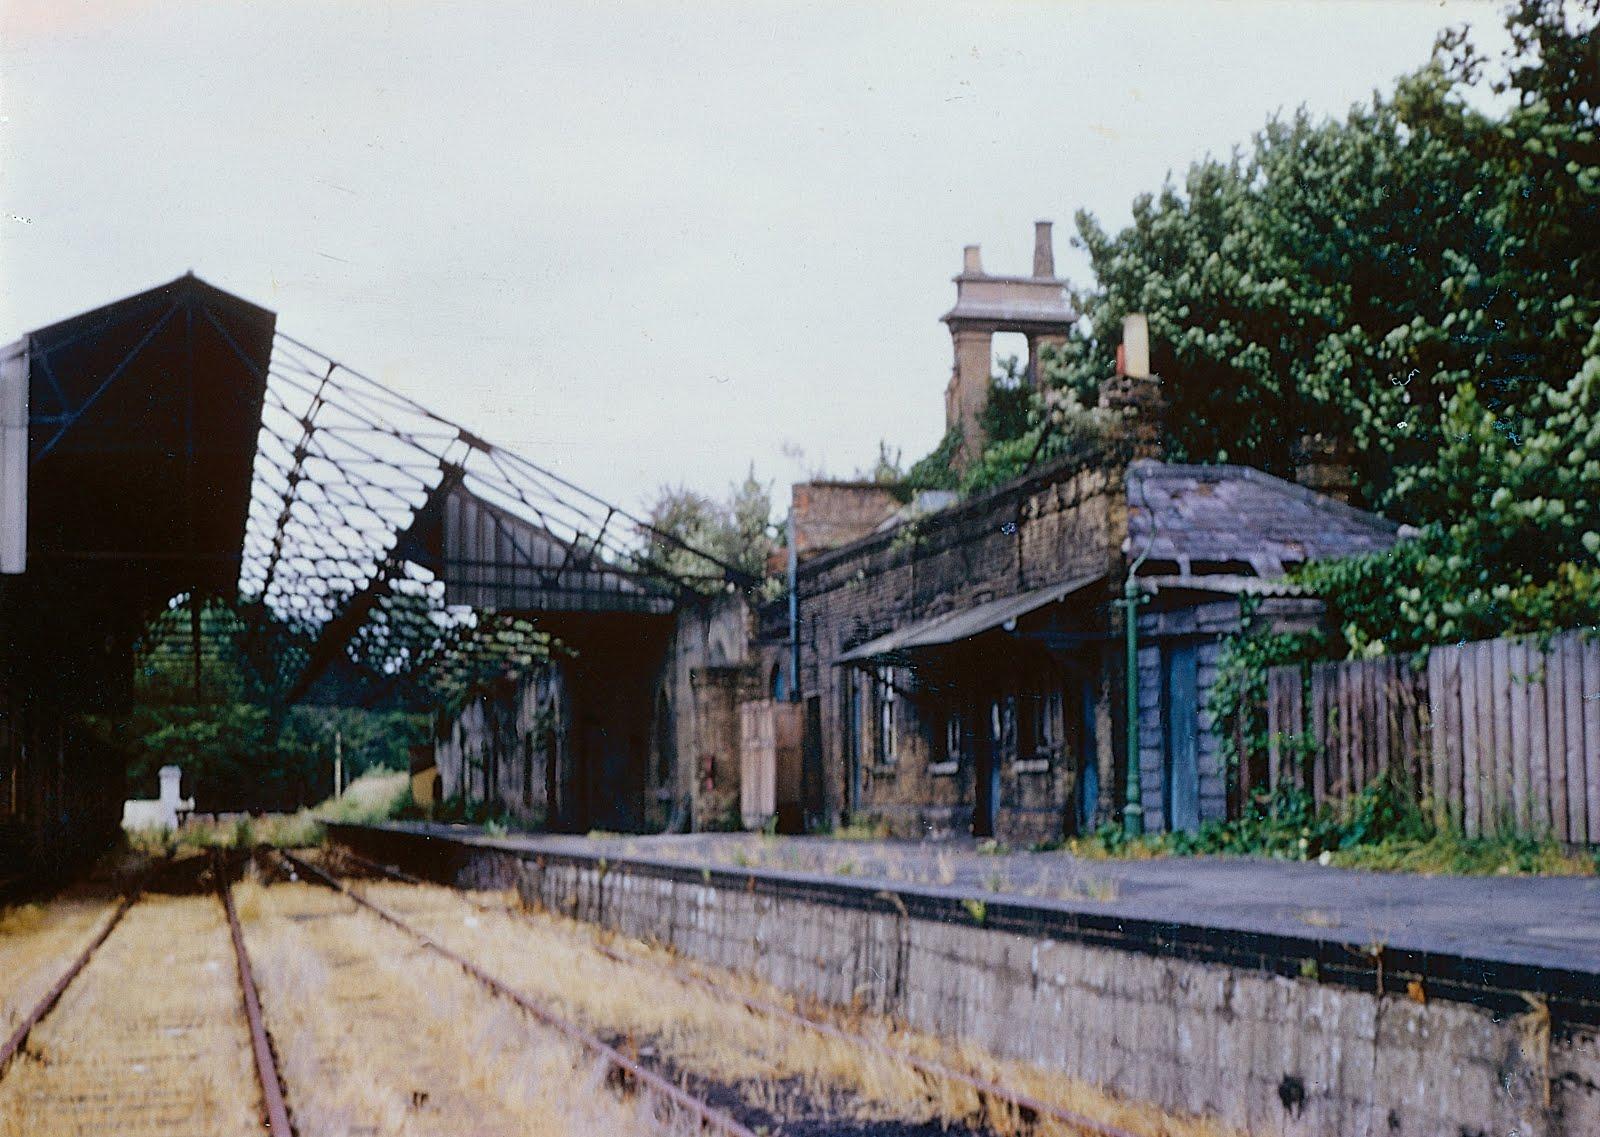 Station 1965